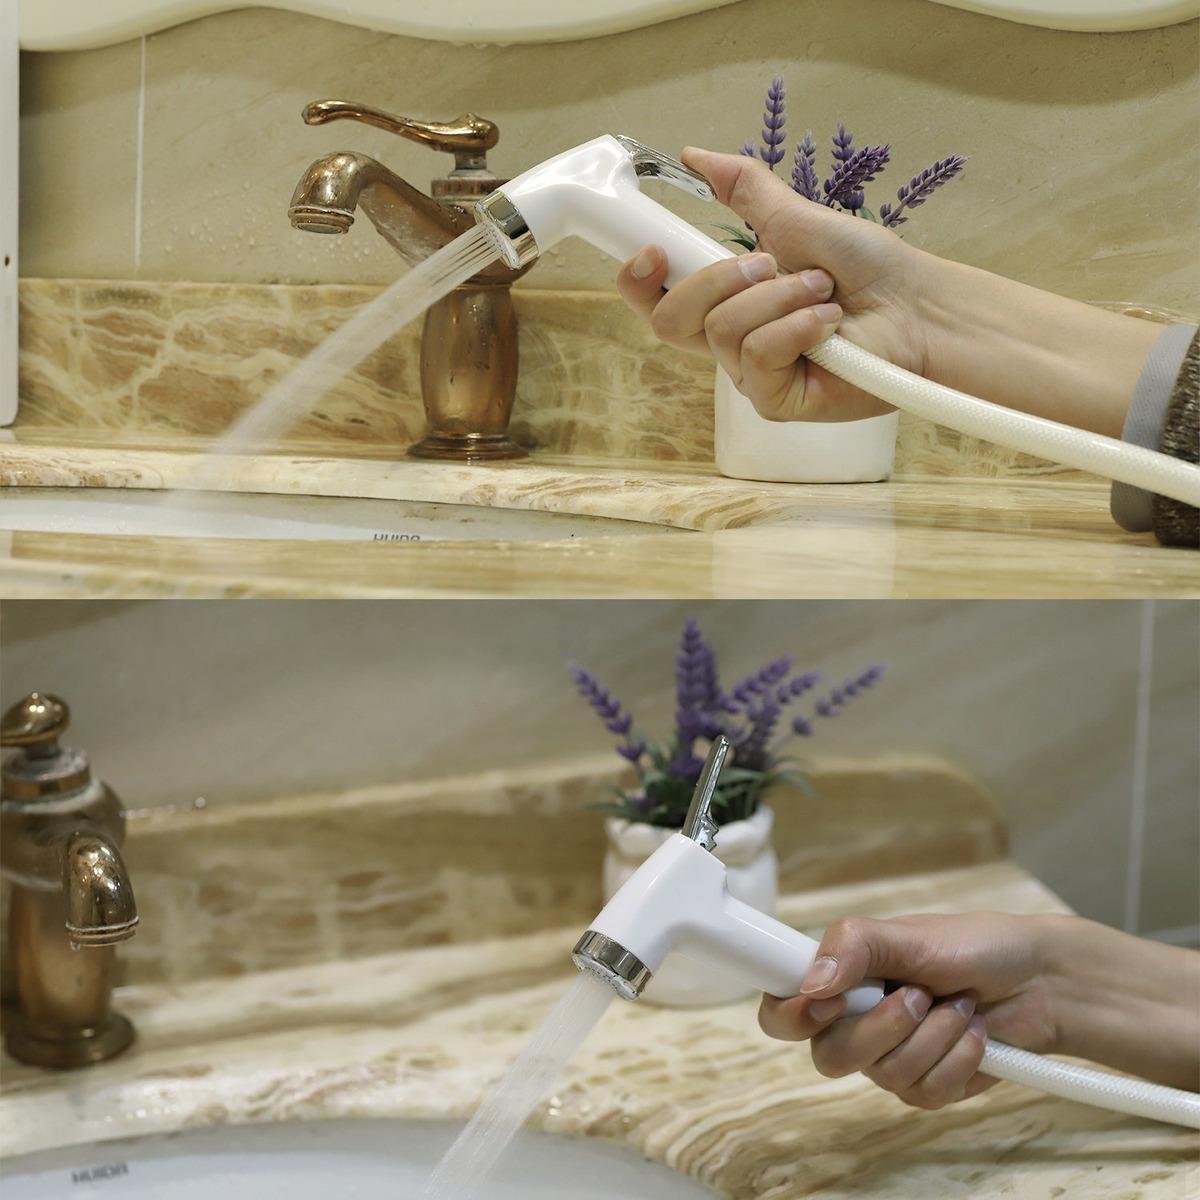 Marvelous Hand Held Bidet Sprayer Bathroom Toilet Set Cloth Diaper Spr Inzonedesignstudio Interior Chair Design Inzonedesignstudiocom